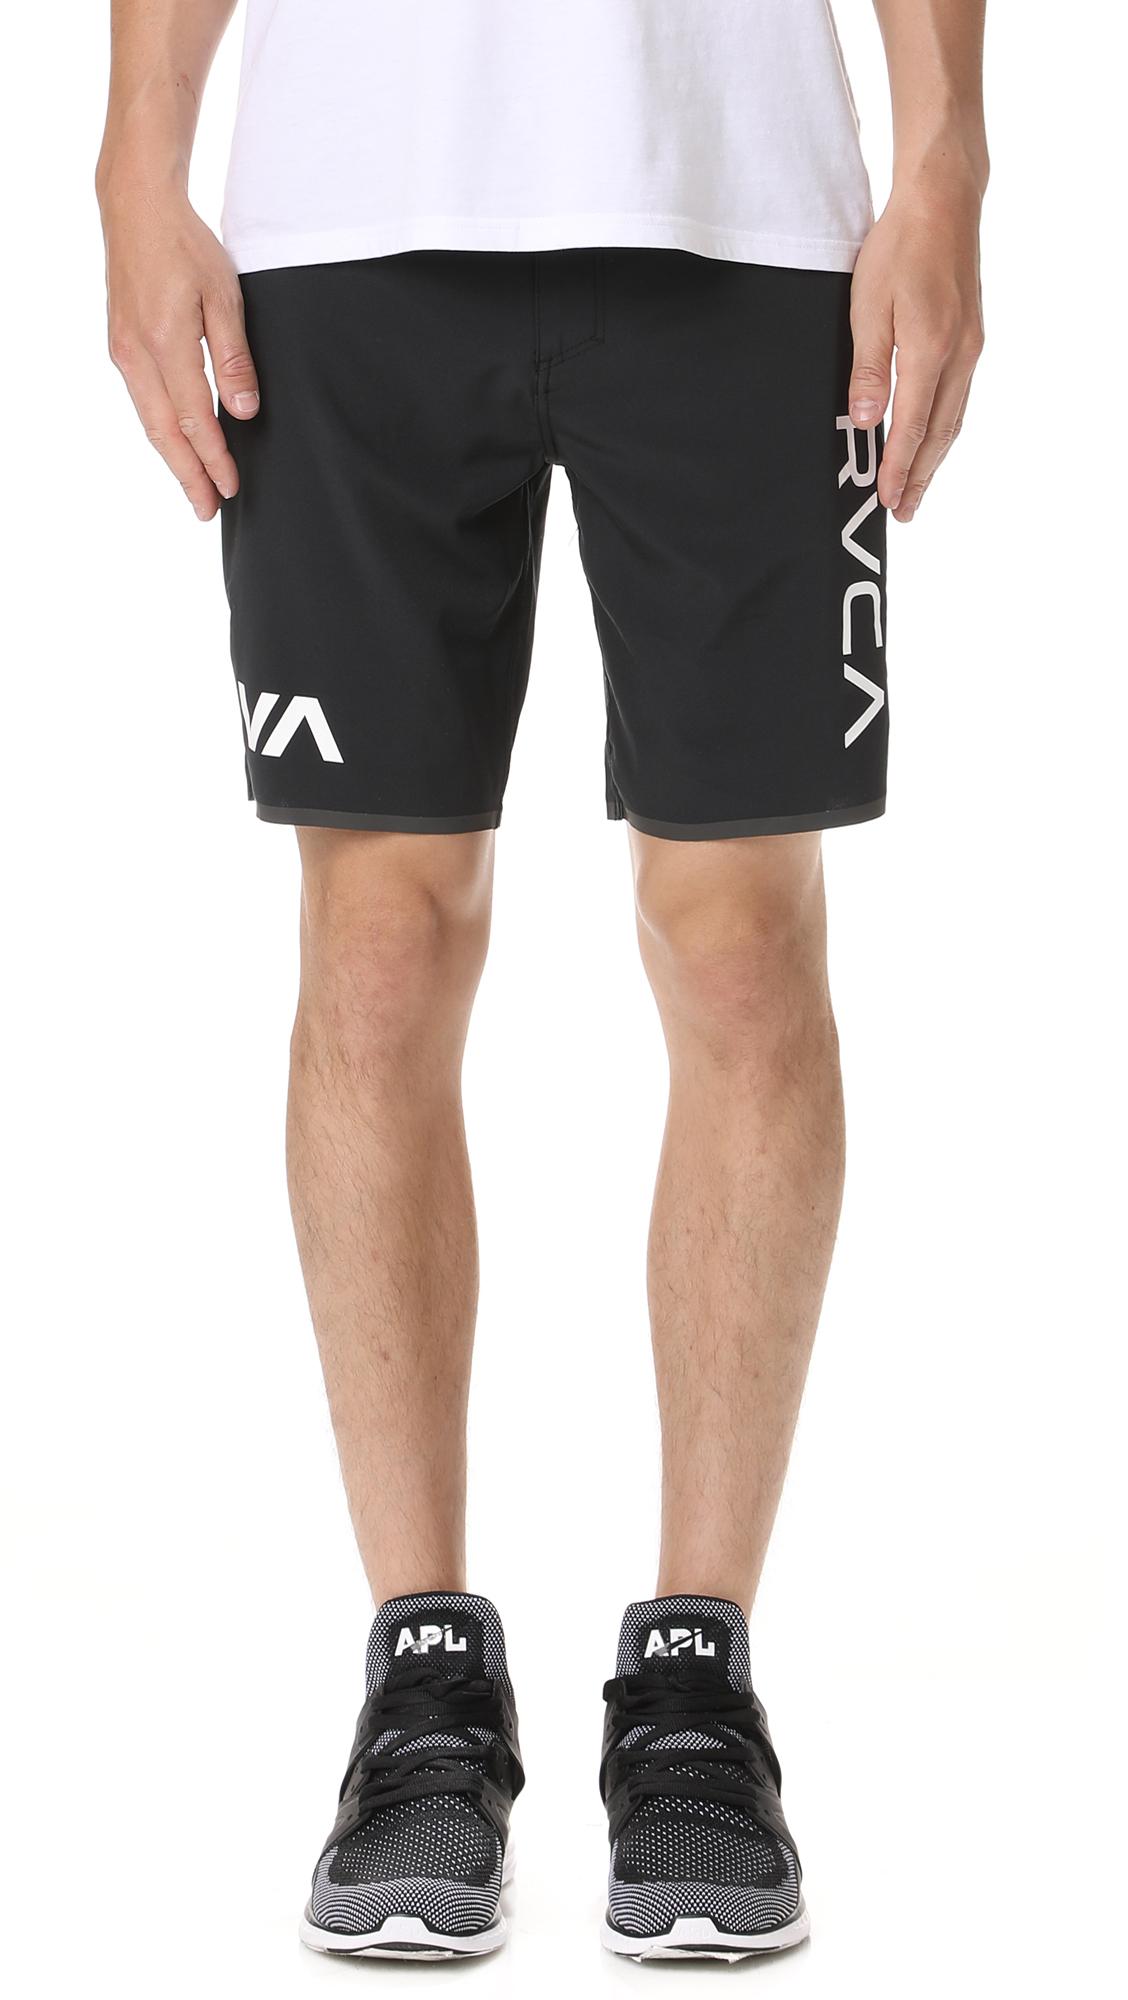 Staff Iii Dual Layer Shorts in Black